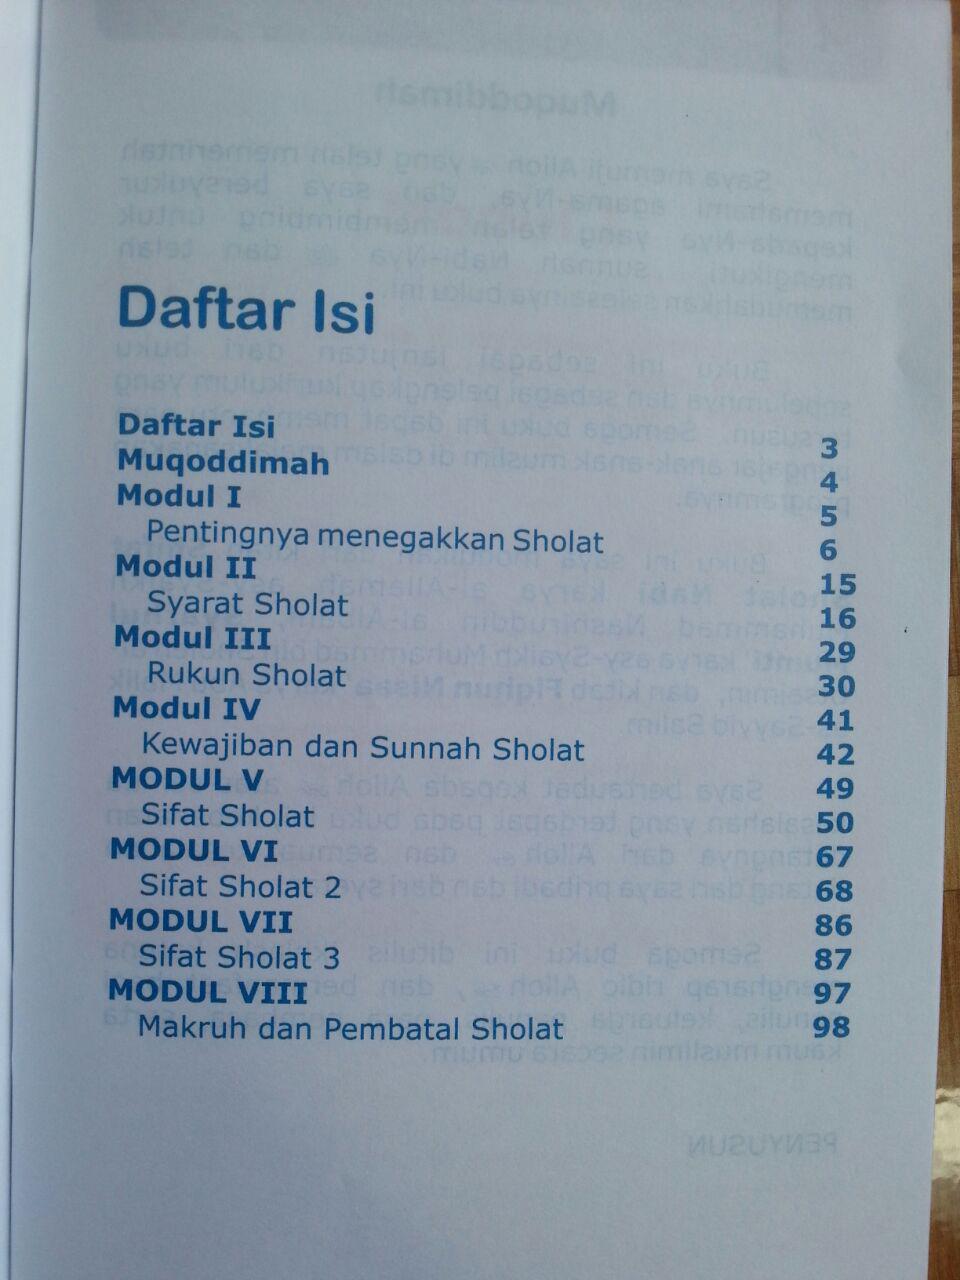 Buku Pegangan Pengajaran Anak Islam Modul Fiqih 3 isi 2